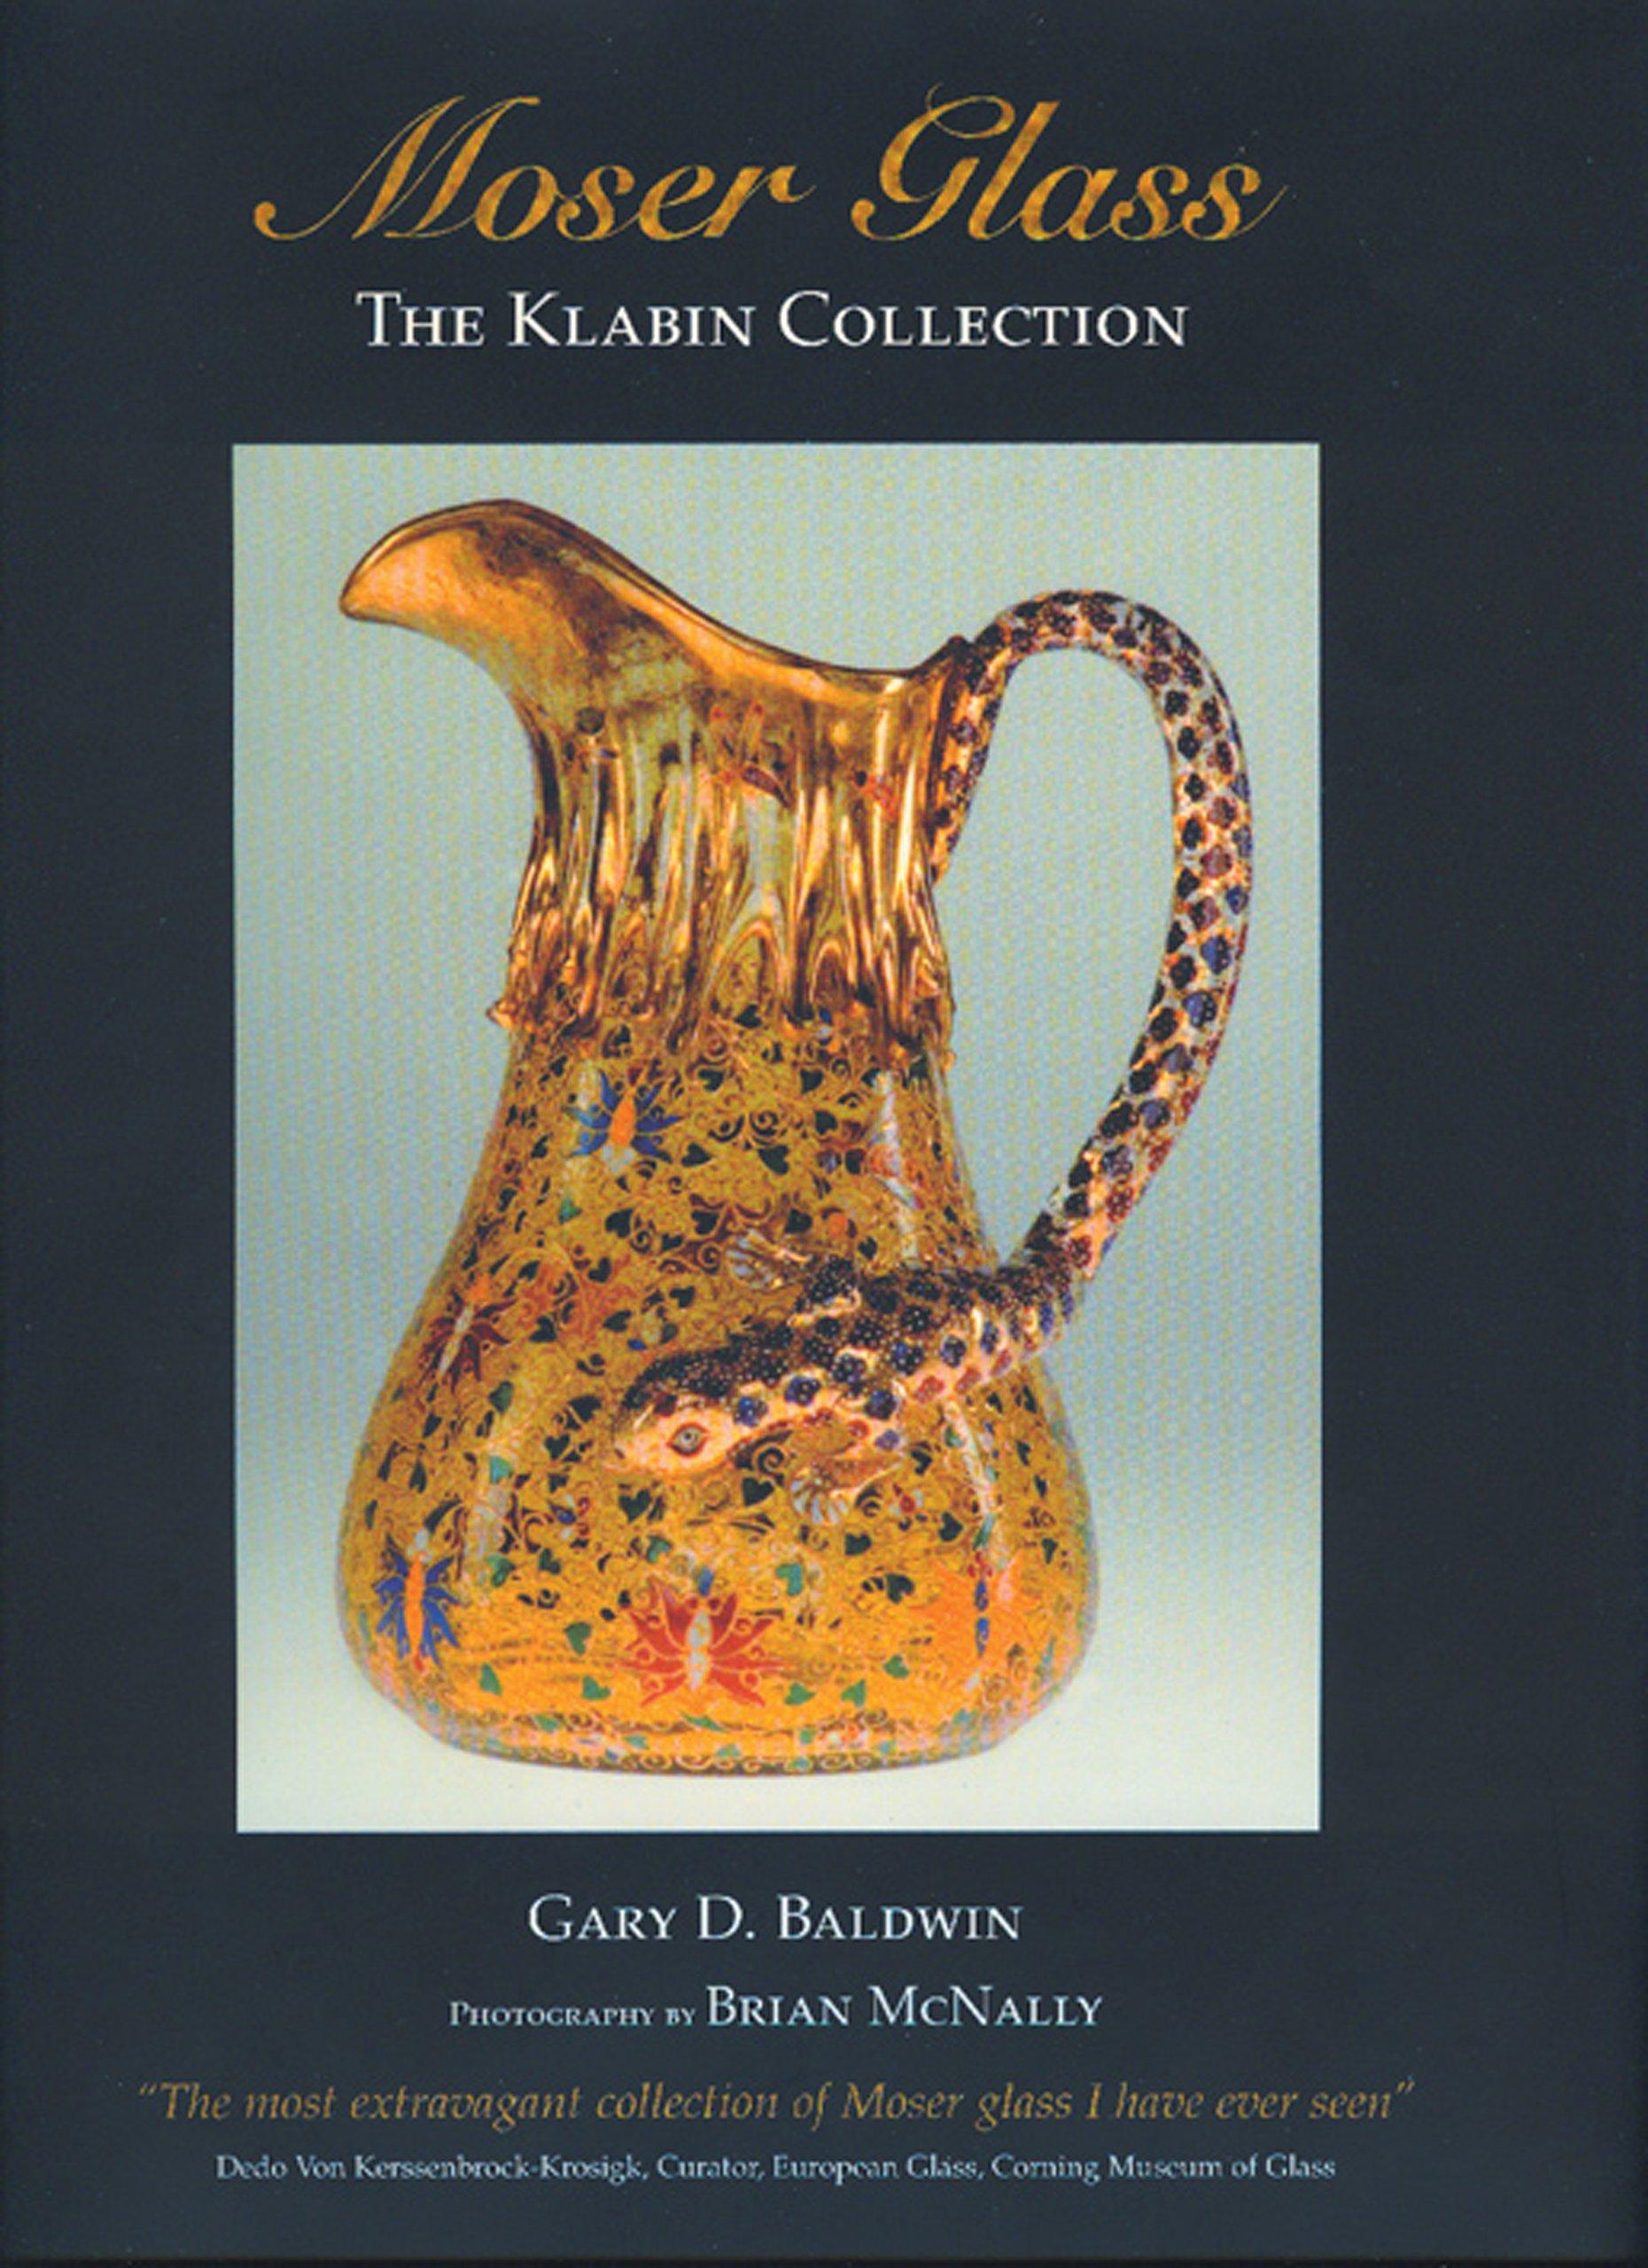 Moser Glass: Klabin Collection: The Klabin Collection